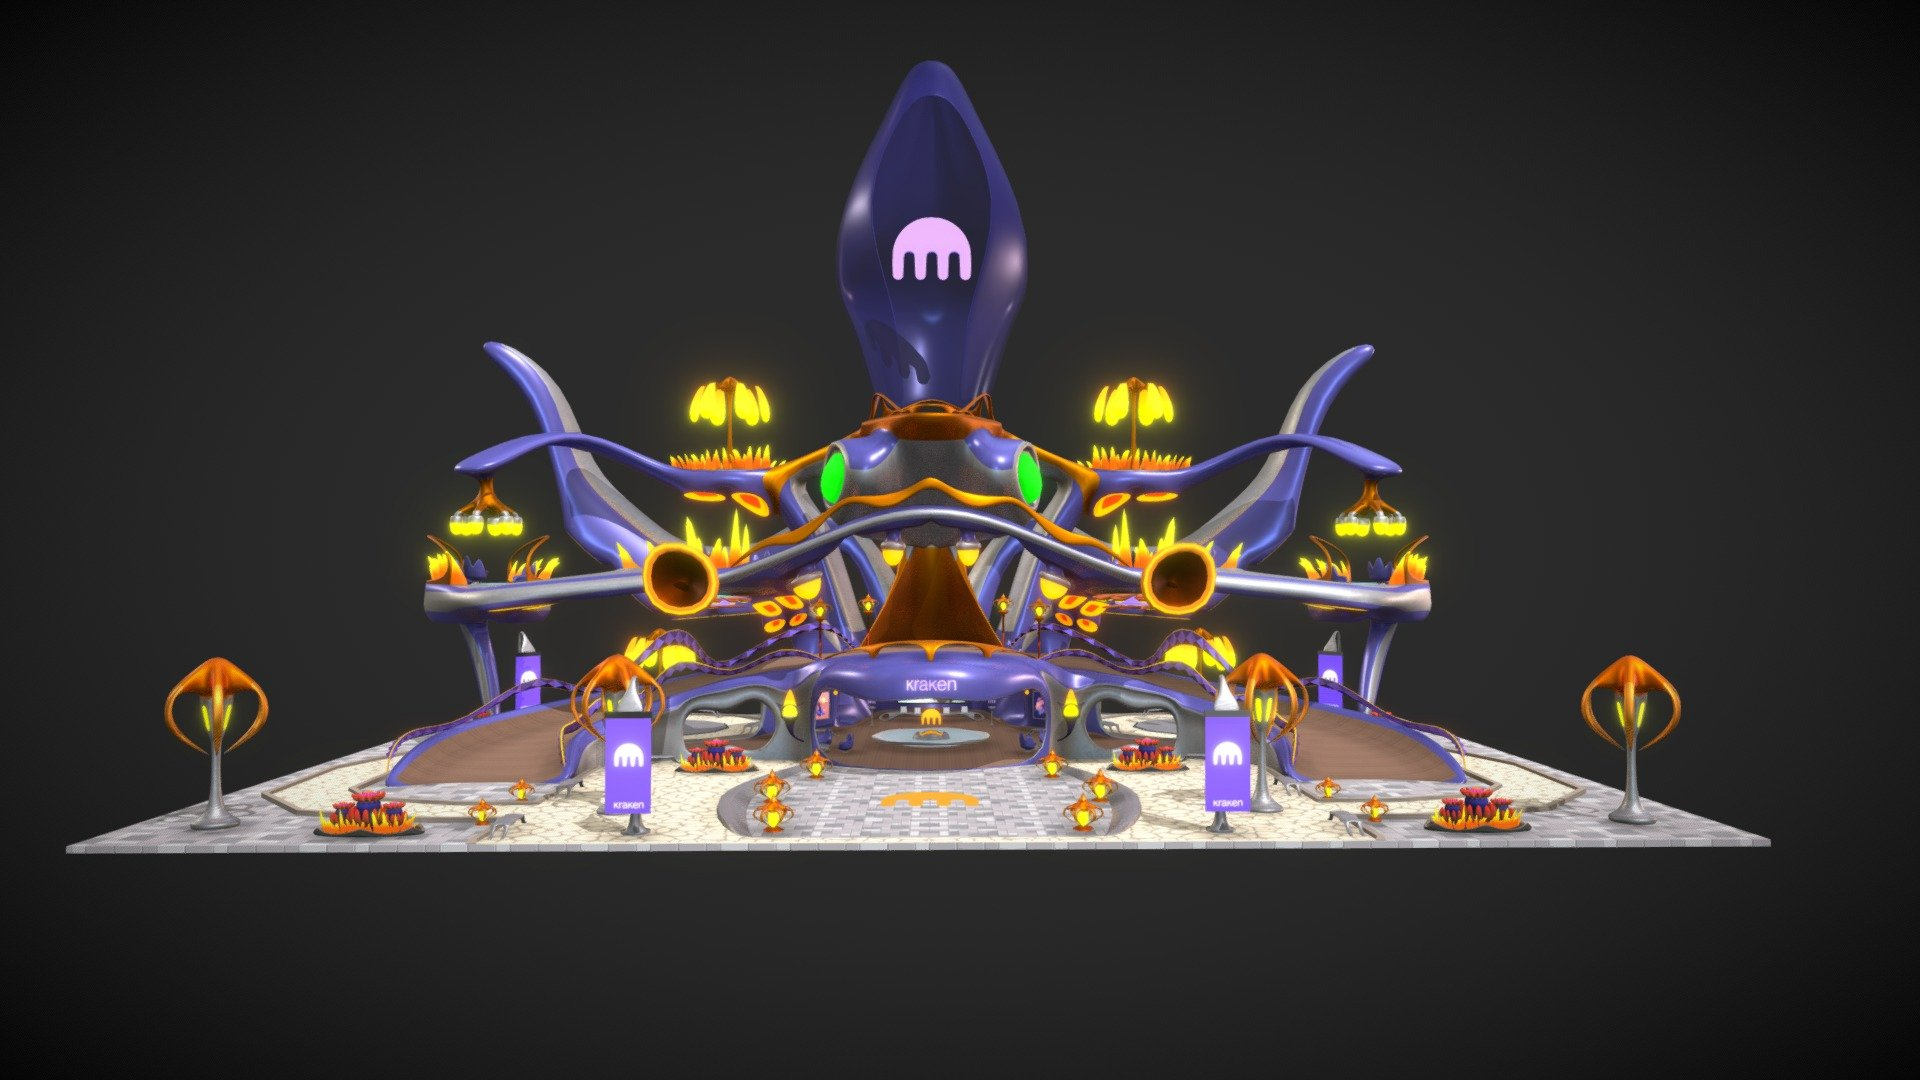 Kraken Exchange HQ - Decentraland - 3D model by Decentraland (@decentraland) [9a81339] - Sketchfab